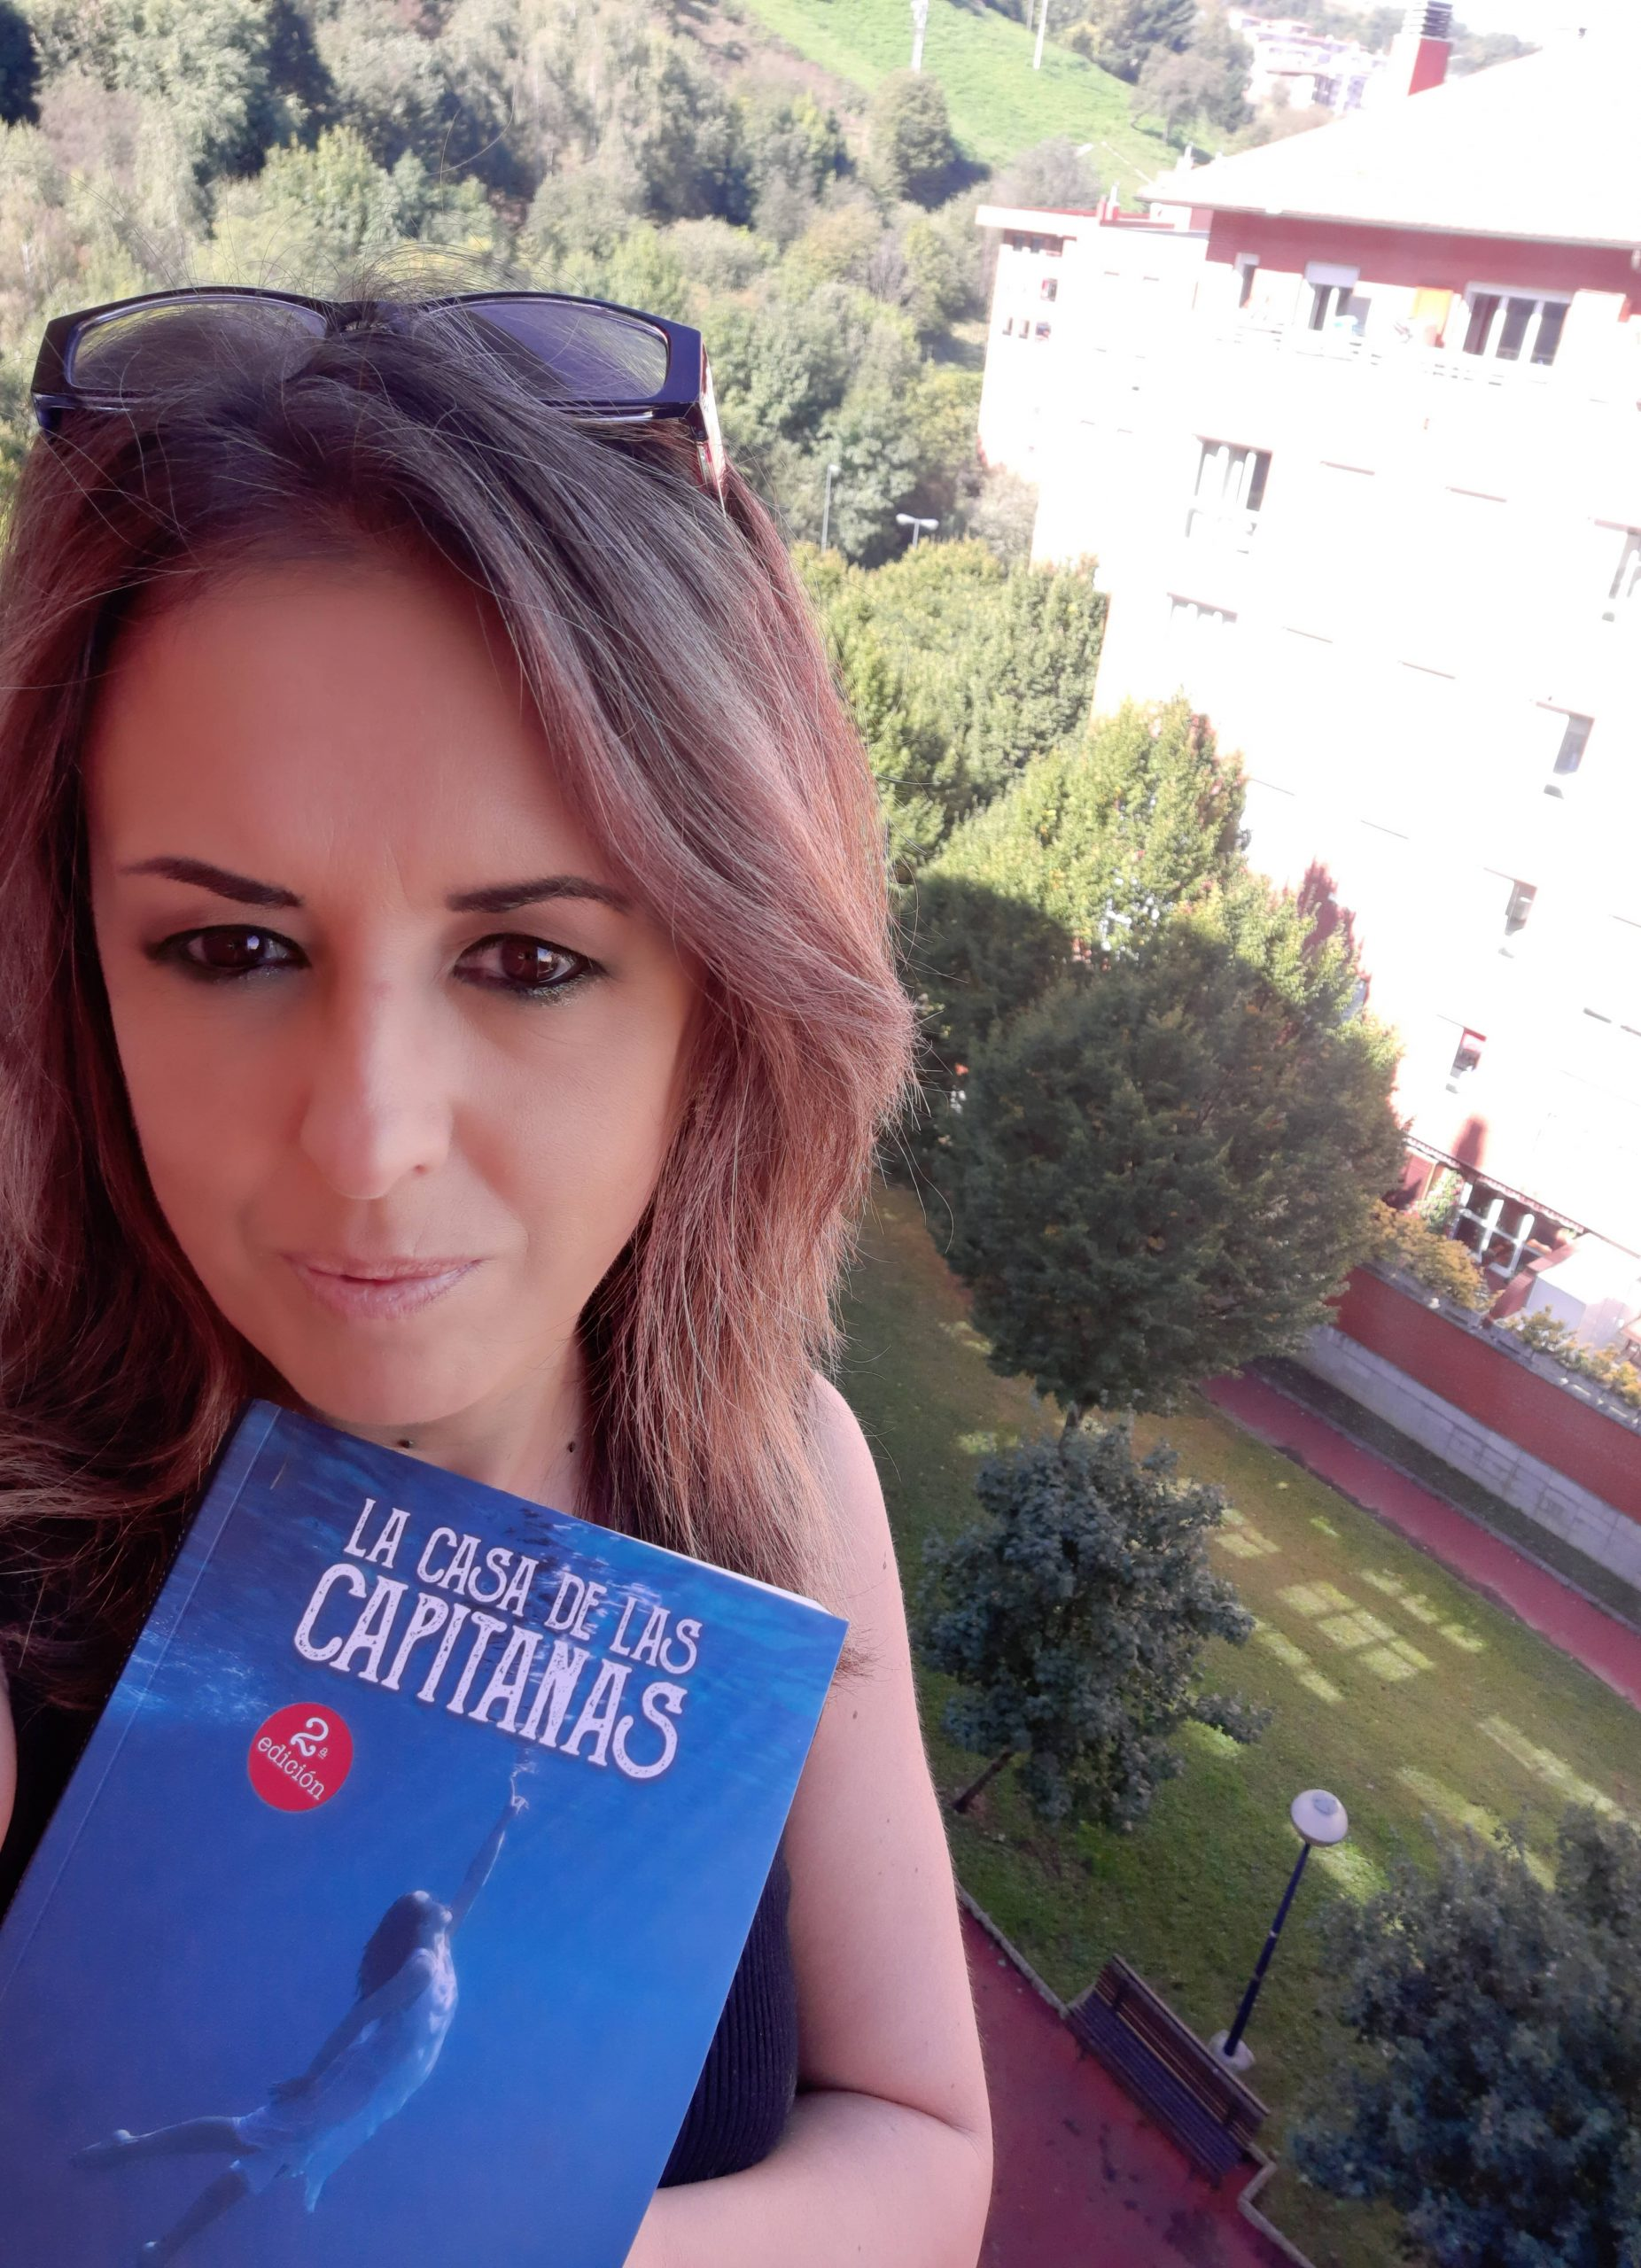 «La casa de las capitanas» ópera prima de Cristina Arroyo González